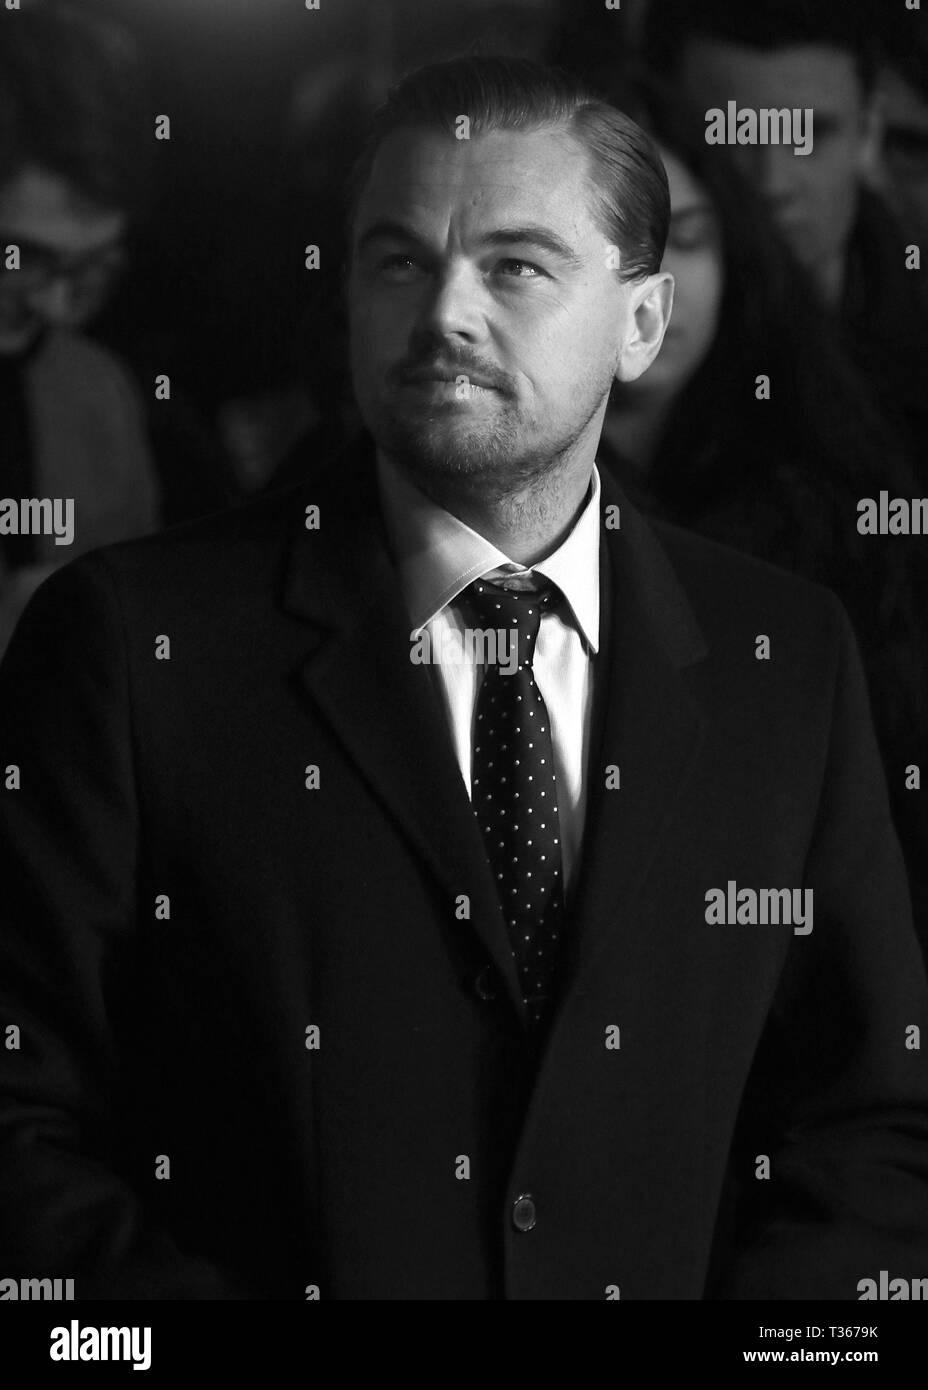 Jan 14, 2016 - London, England, UK - 'The Revenant' UK Premiere, Empire Leicester Square - Red Carpet Arrivals Photo Shows: Leonardo DiCaprio - Stock Image